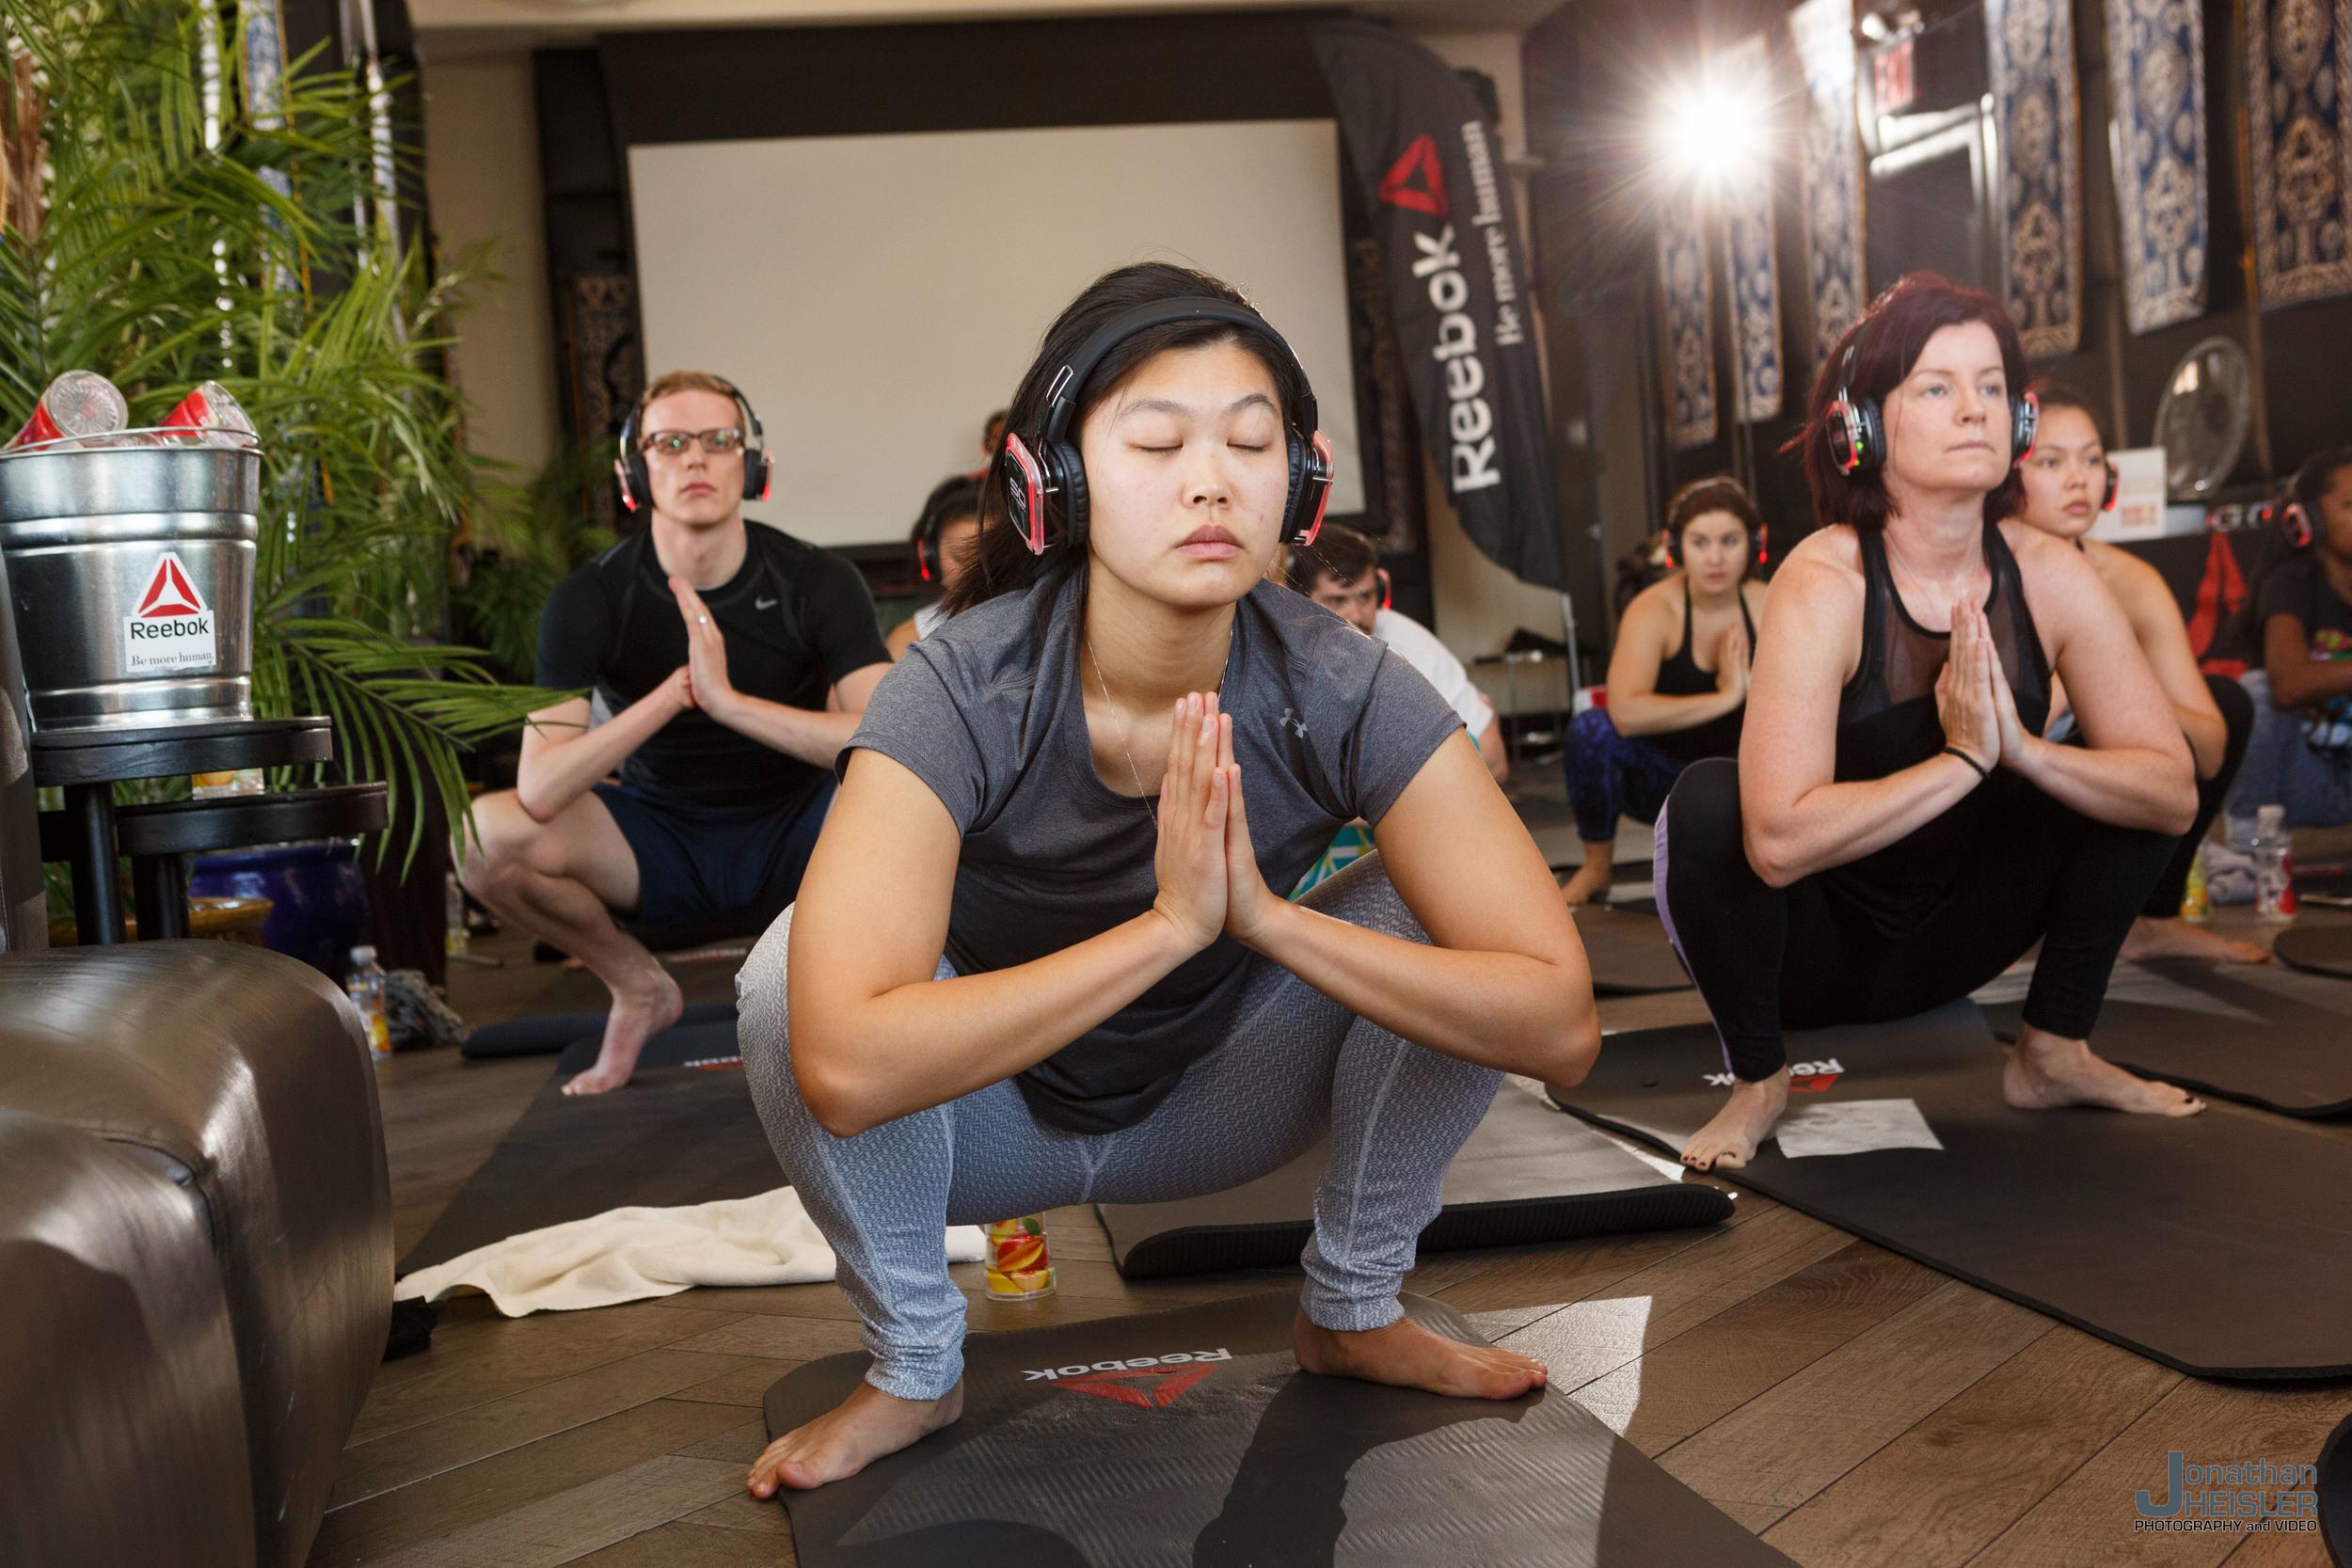 Reebok NYC Yoga_ Gansevoort Hotel NYC __  Jonathan Heisler _ 11.21.2015_015f_5.6.jpg